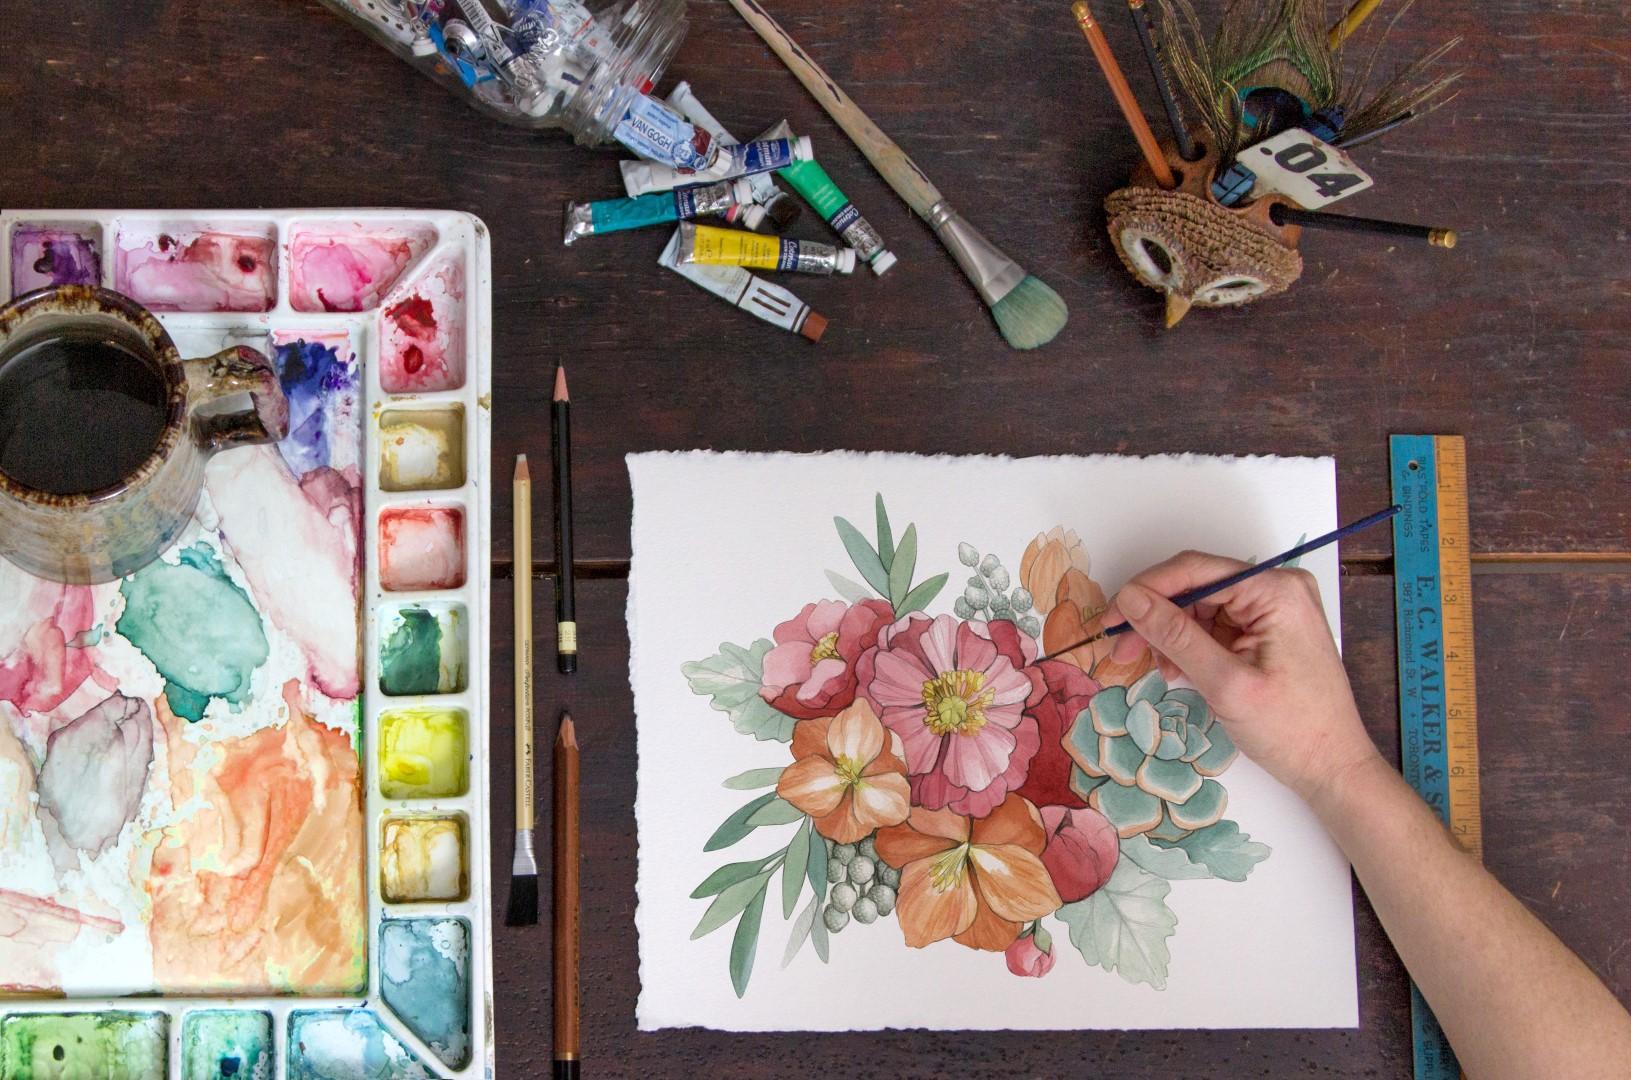 Peach-Floral-Painting-Alicias-Infinity (Large).jpg